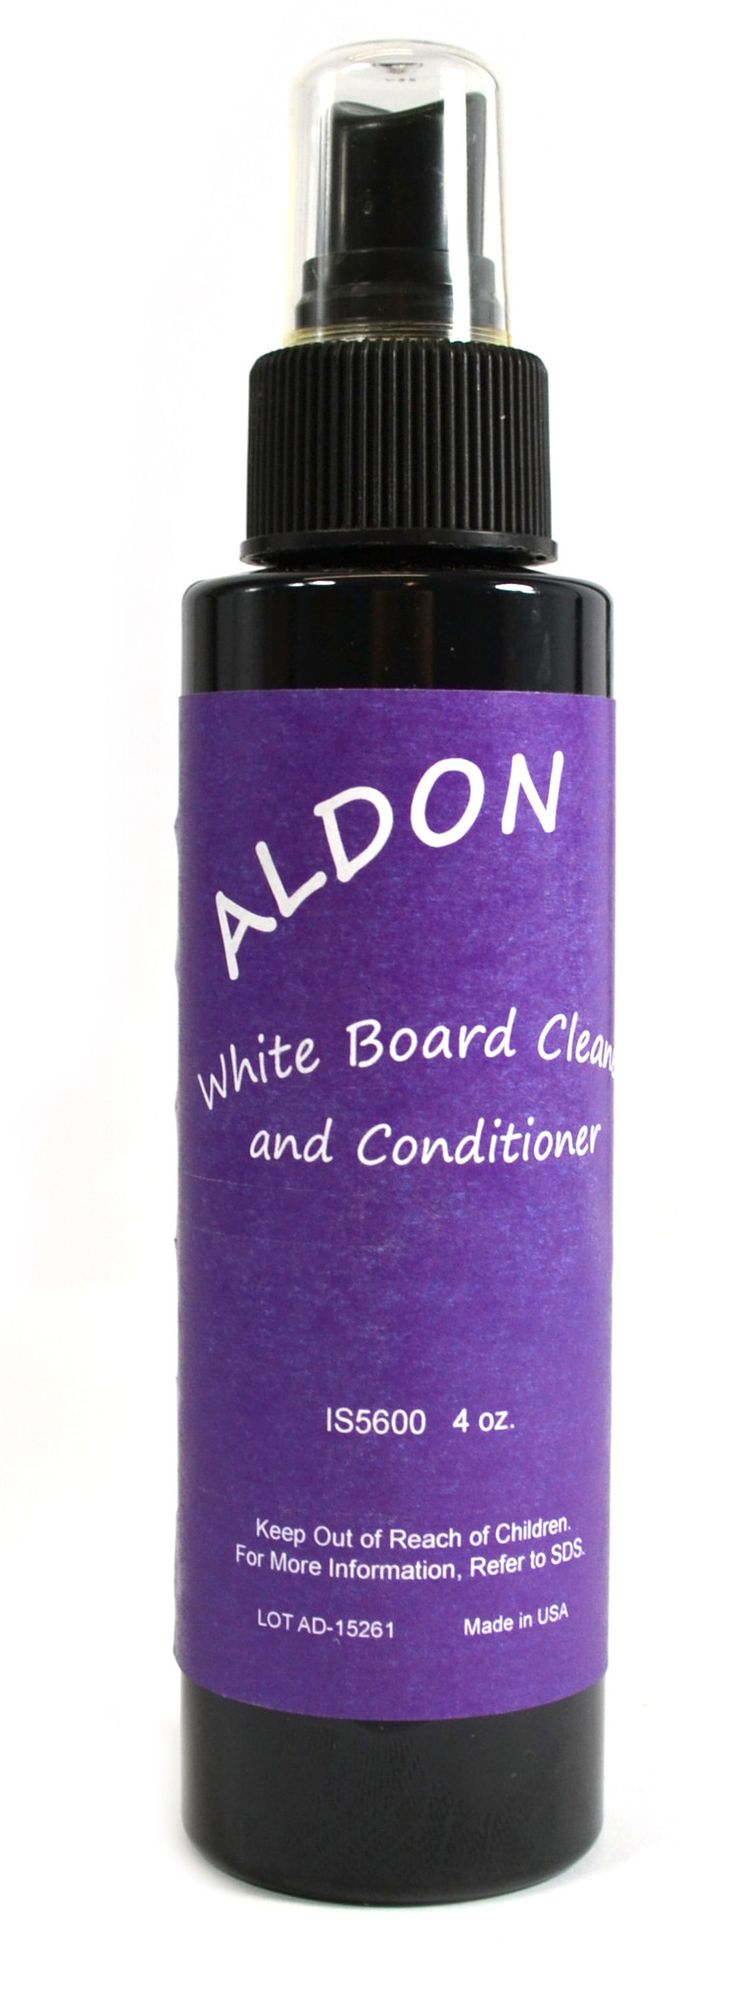 Innovating Science - Aldon White Board Cleaner